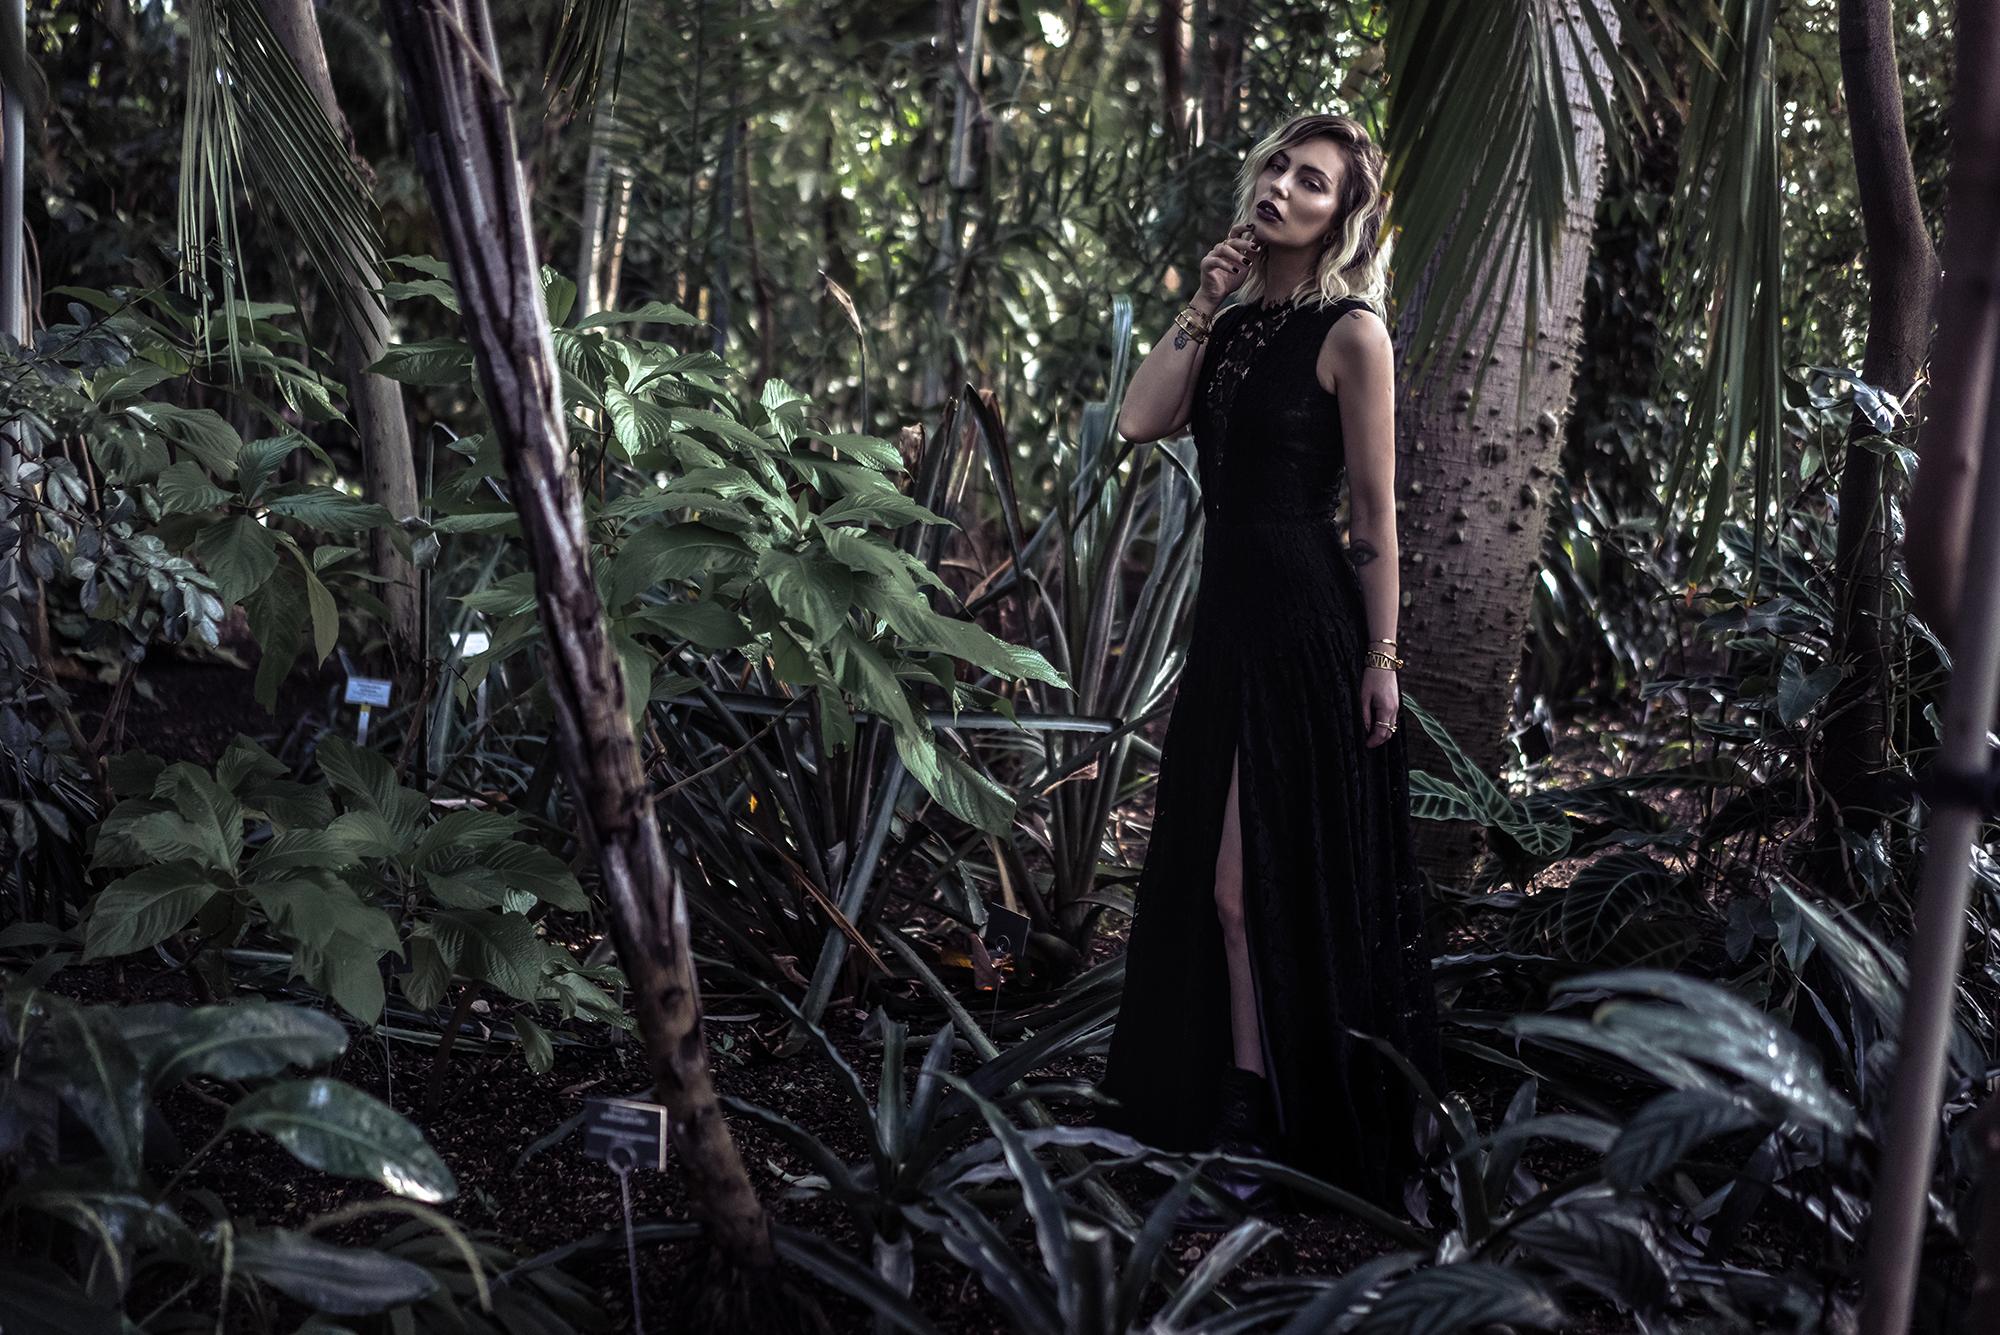 Queen of the night, fragrance campaign for Alexander McQueen | photos: Fee-Gloria Groenemeyer | location: botanic garden in Berlin | dark editorial shooting